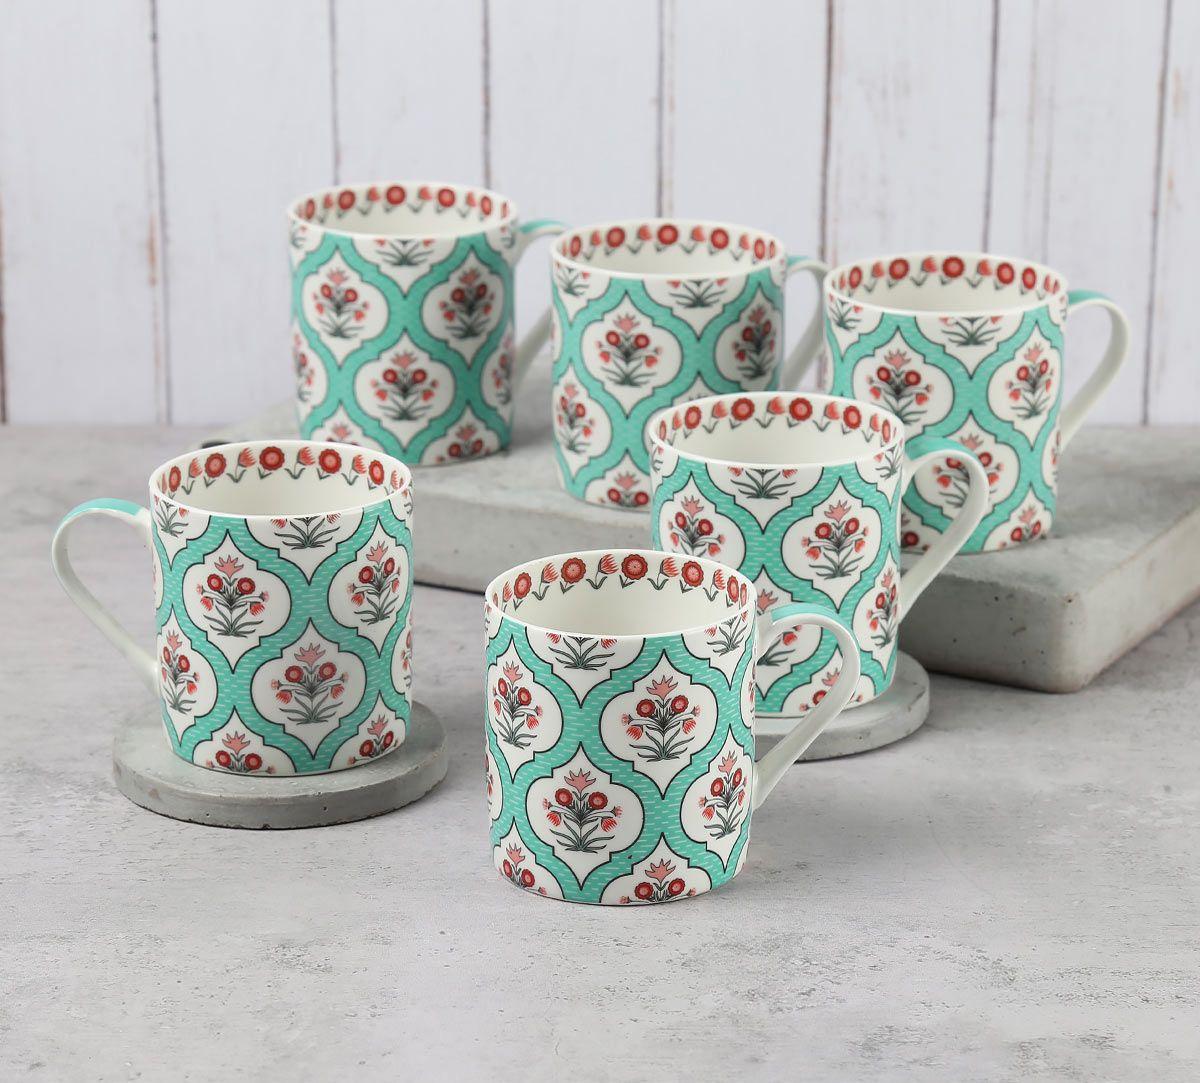 India Circus Teal Lattice Motifs Coffee Mugs Set of 6